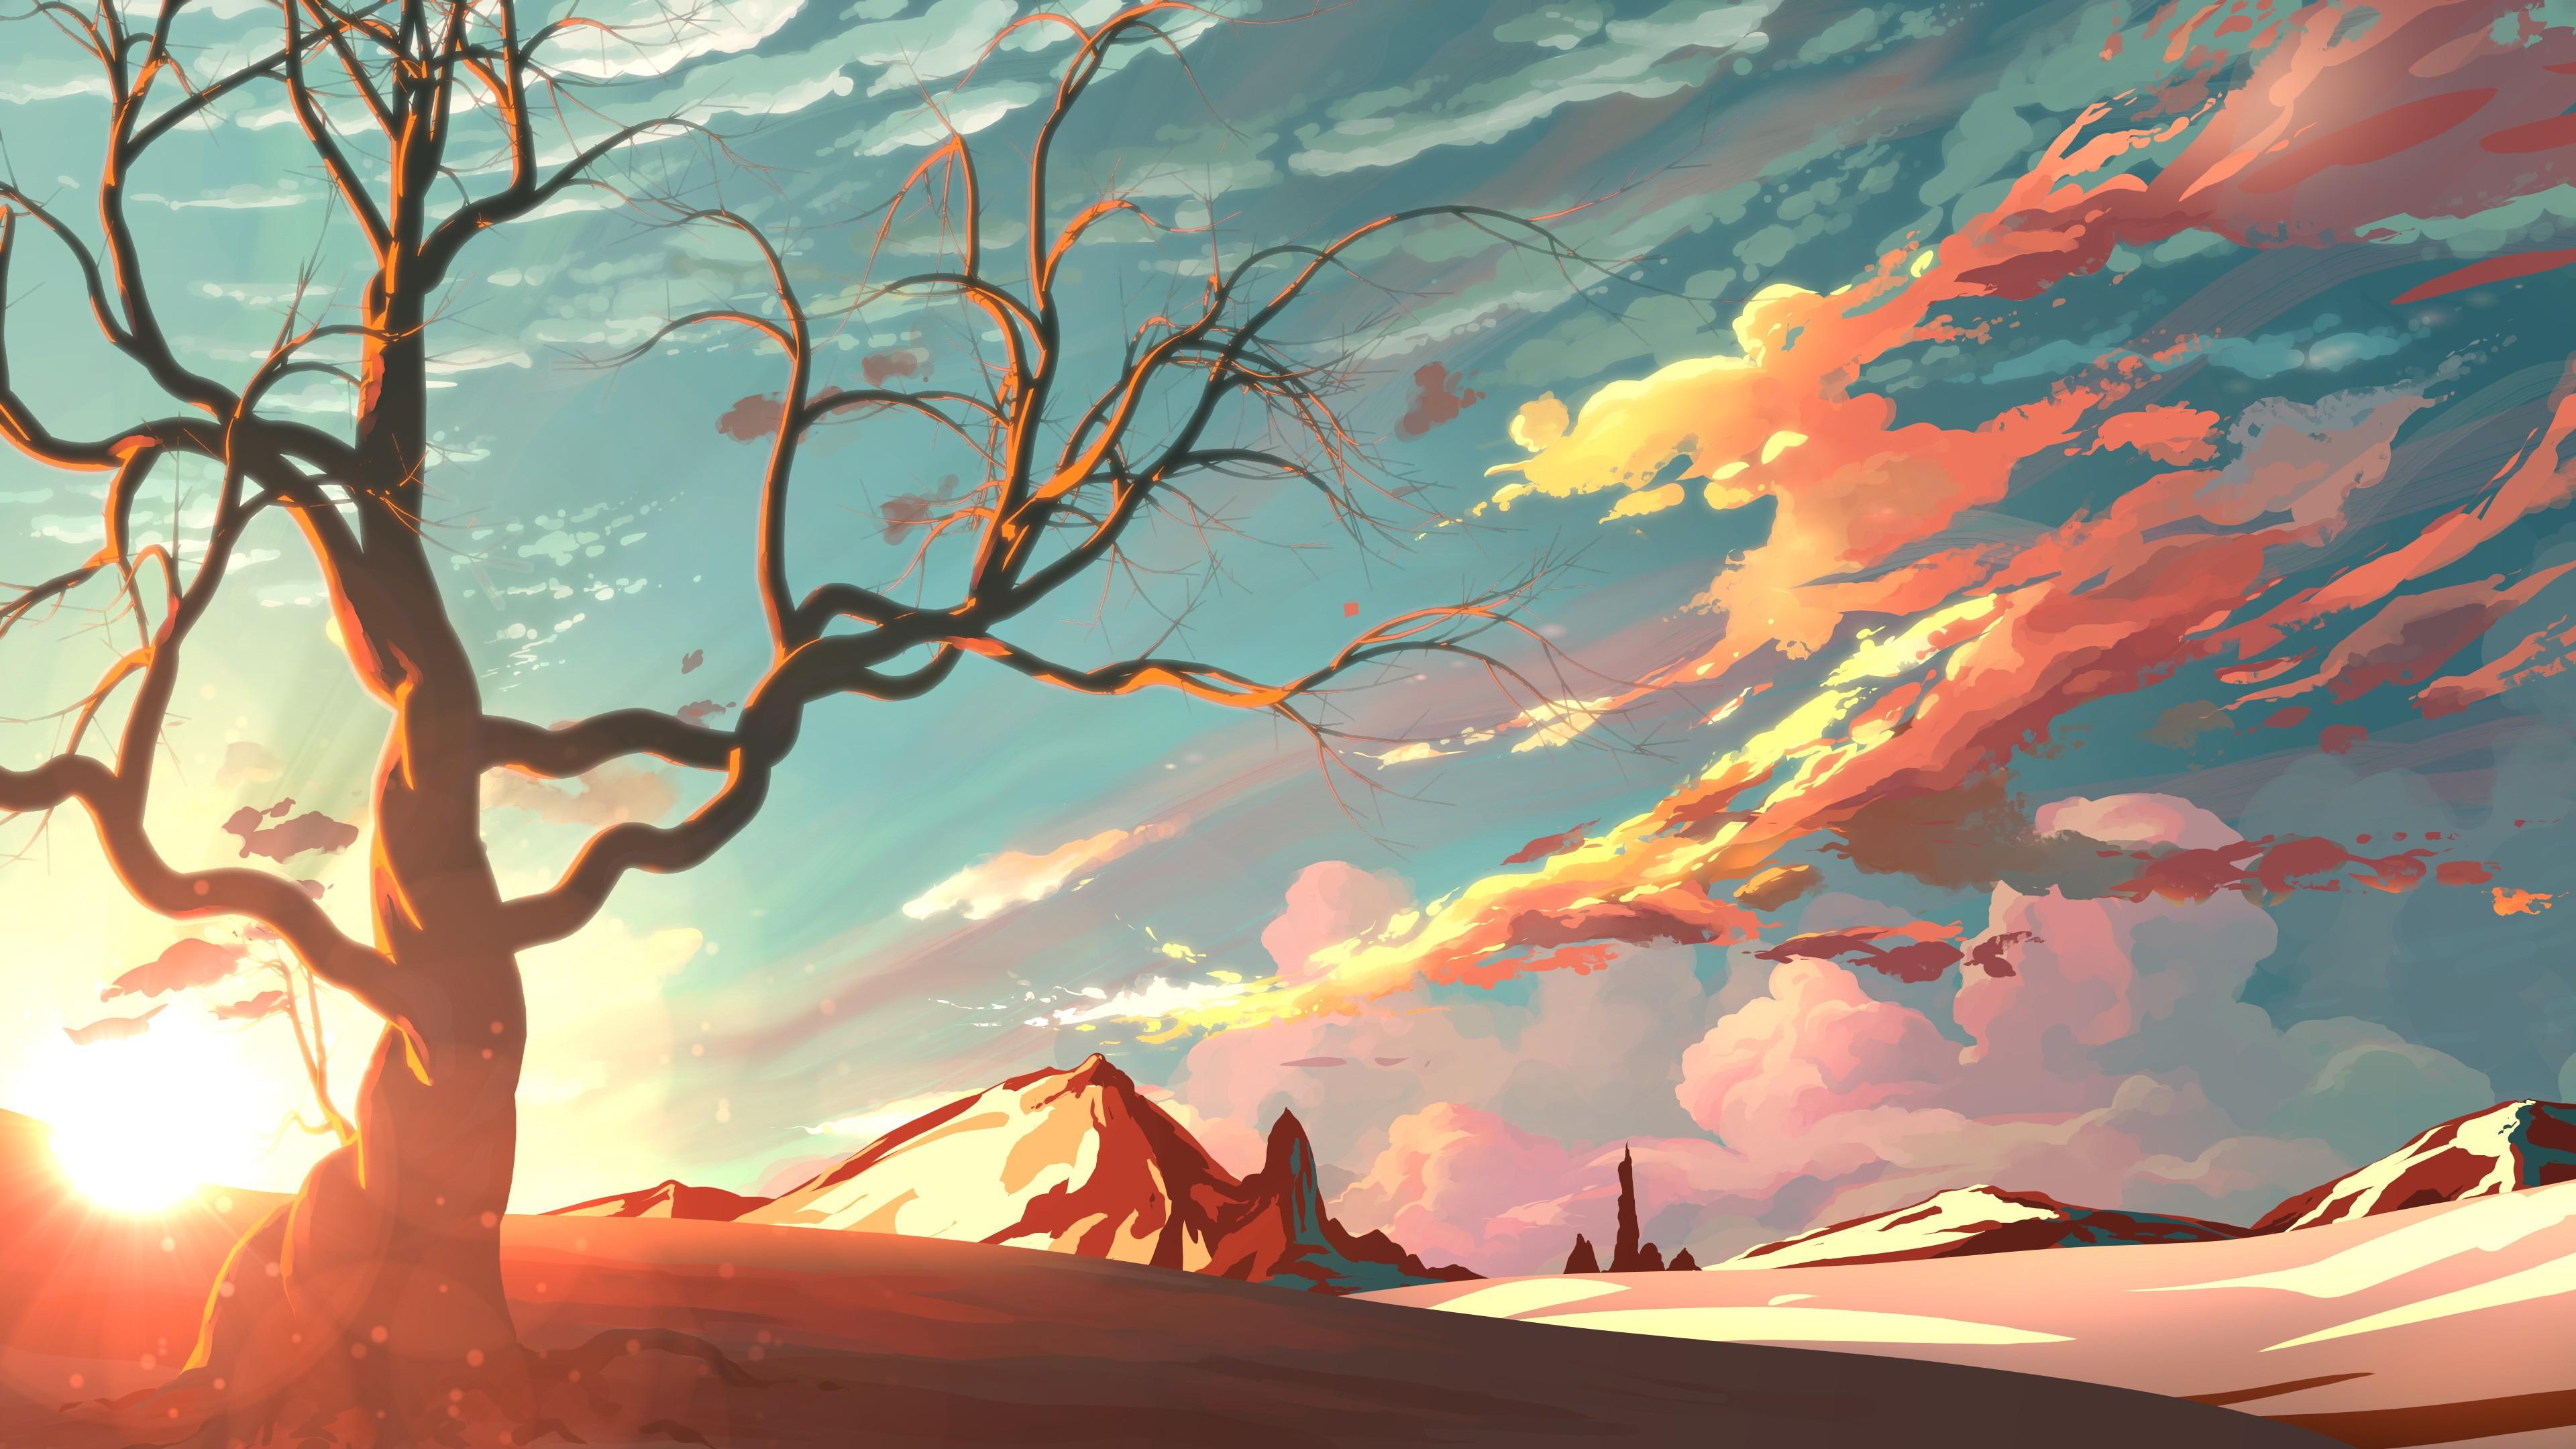 General 3840x2160 artwork landscape sky mountains nature trees snow clouds sunset digital art illustration